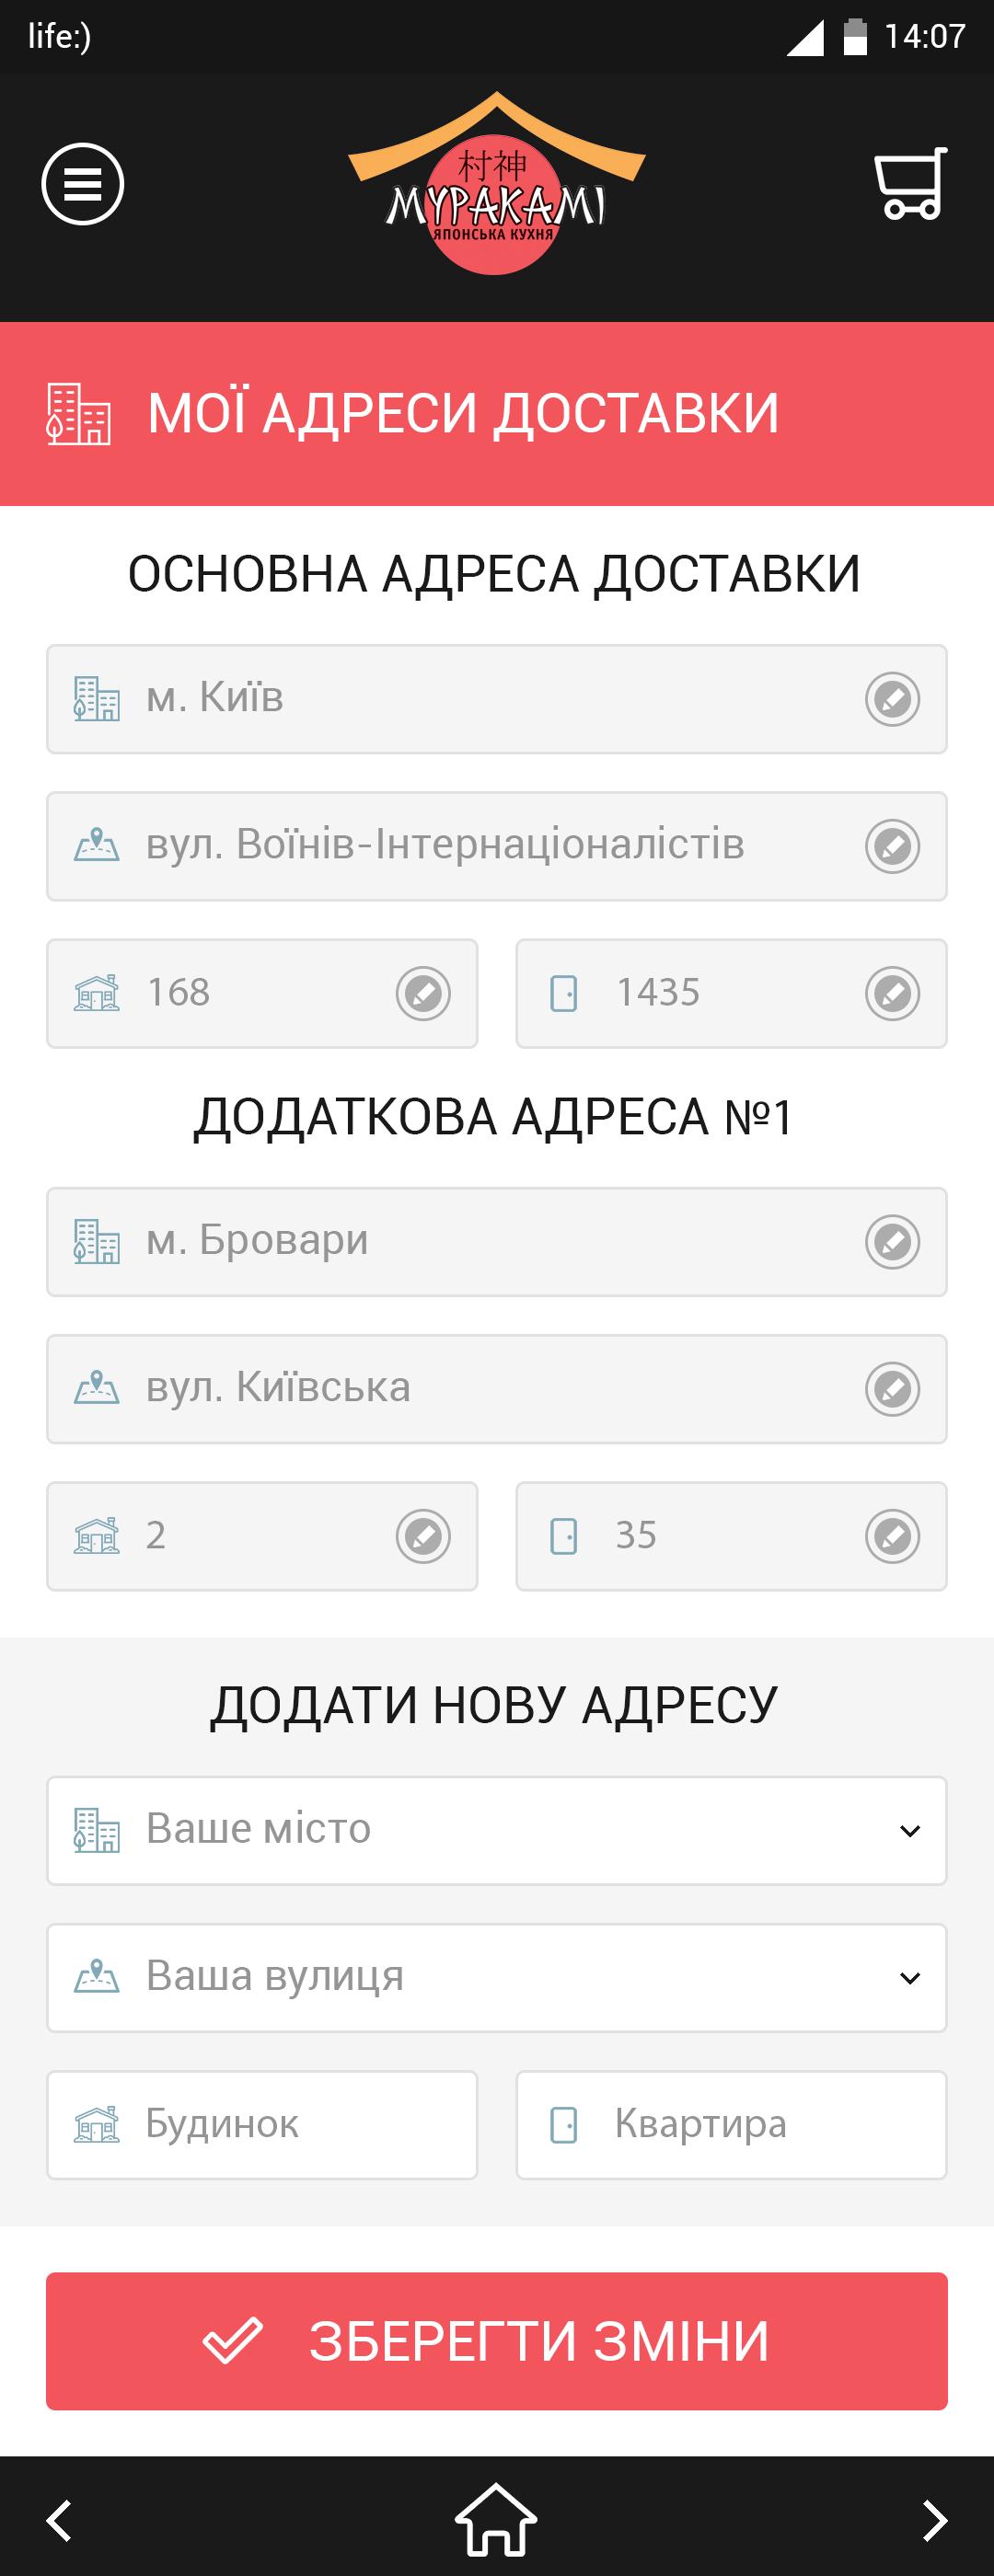 app_murakami_v3_logged_delivery